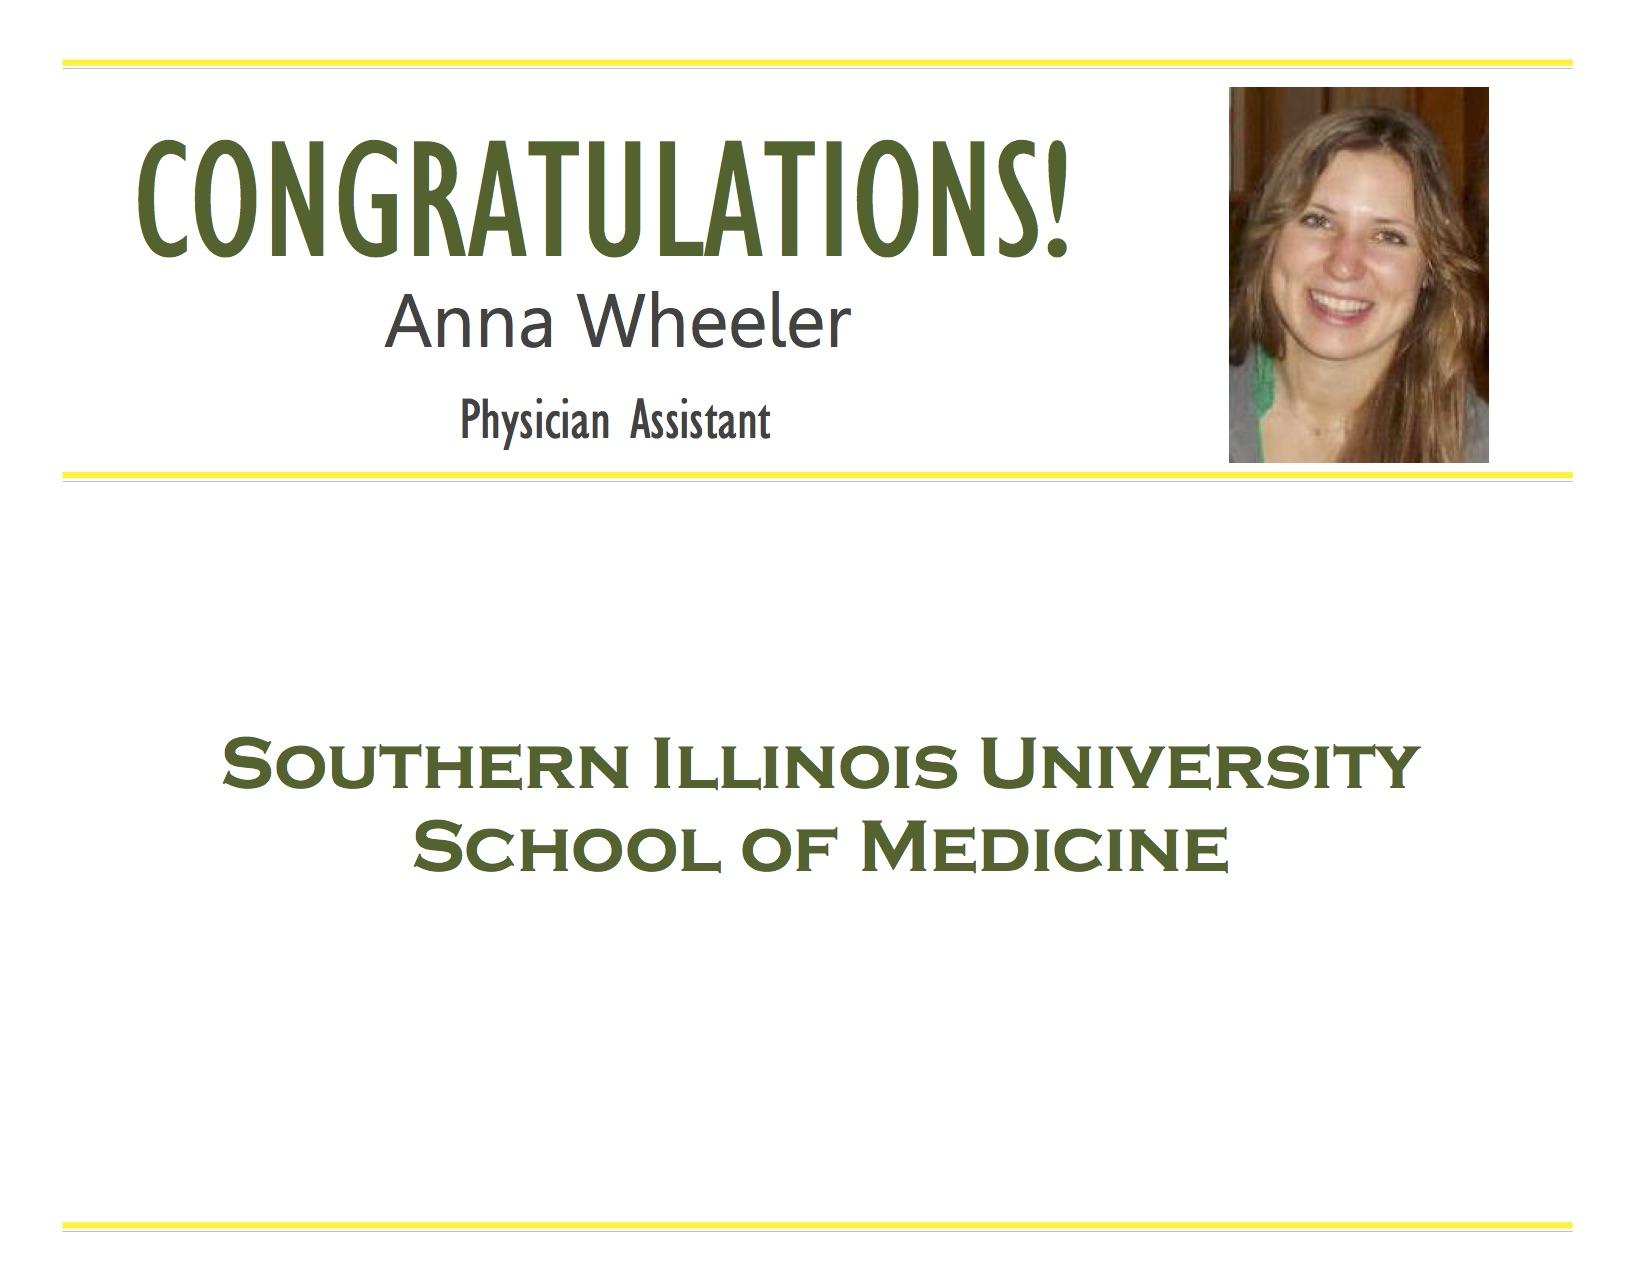 Anna Wheeler (1).jpg